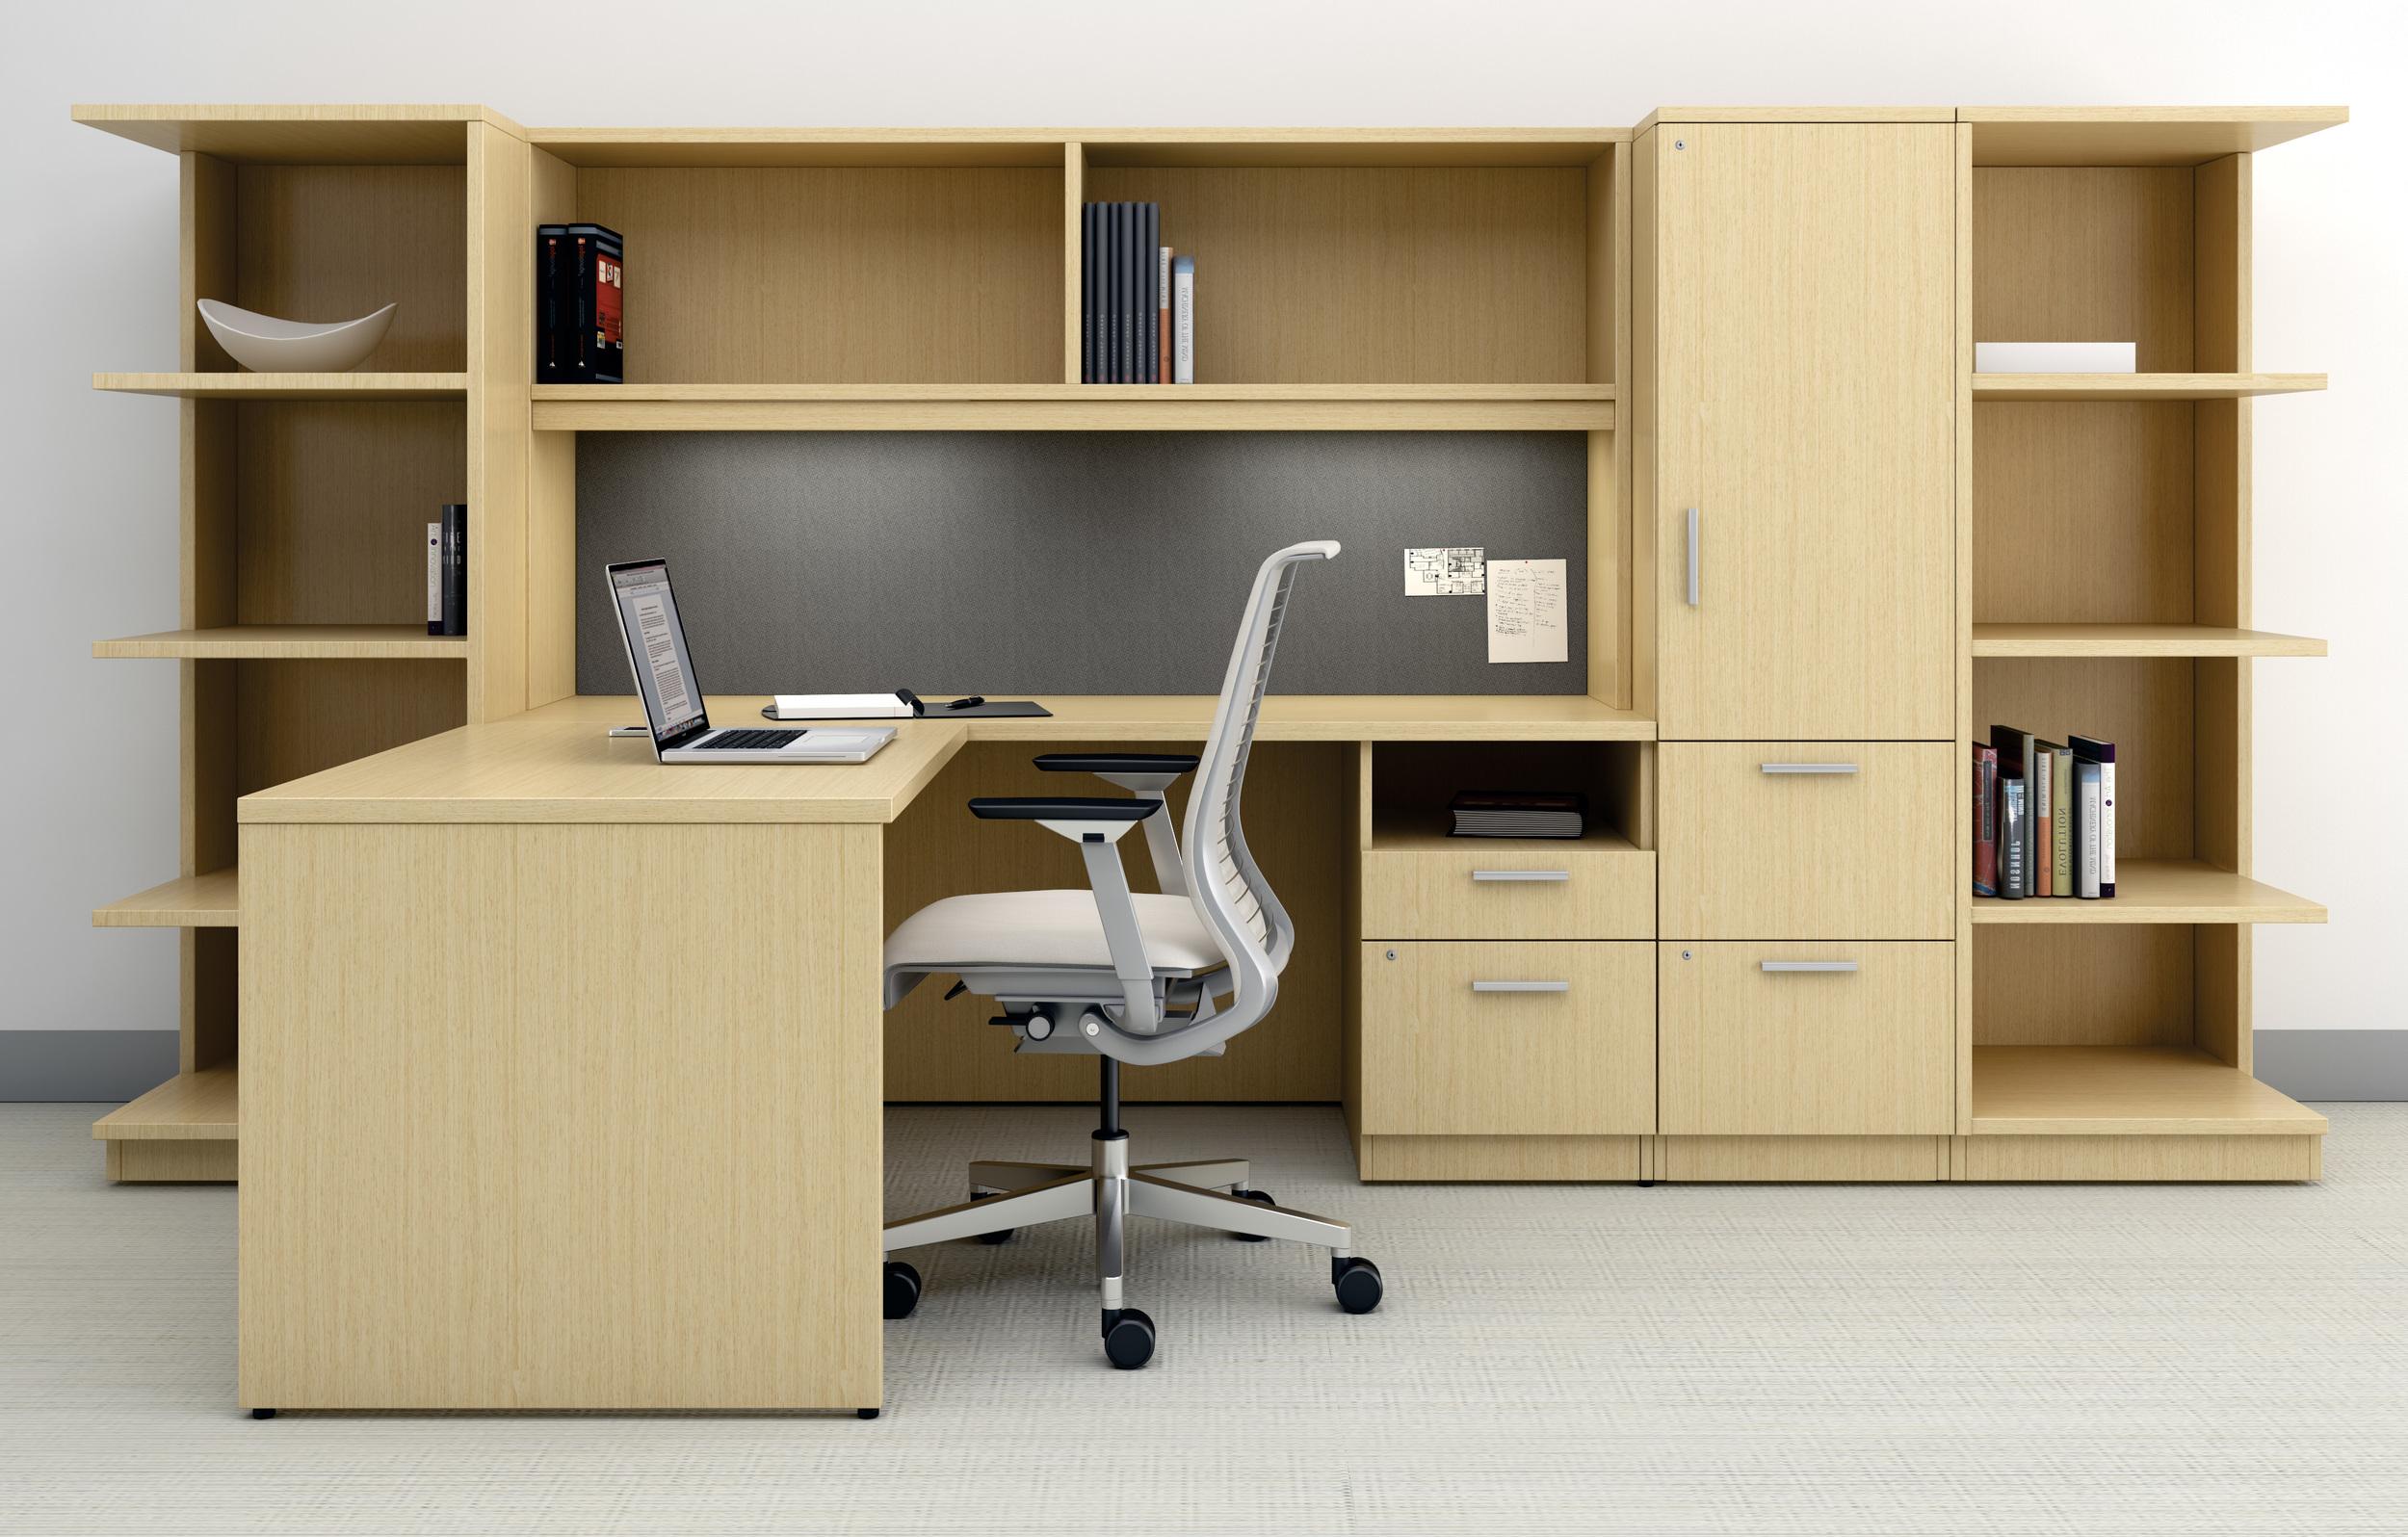 choosing-good-office-cabinets-in-dubai-jantiscrapews-living-room-photo-office-cabinets.jpg